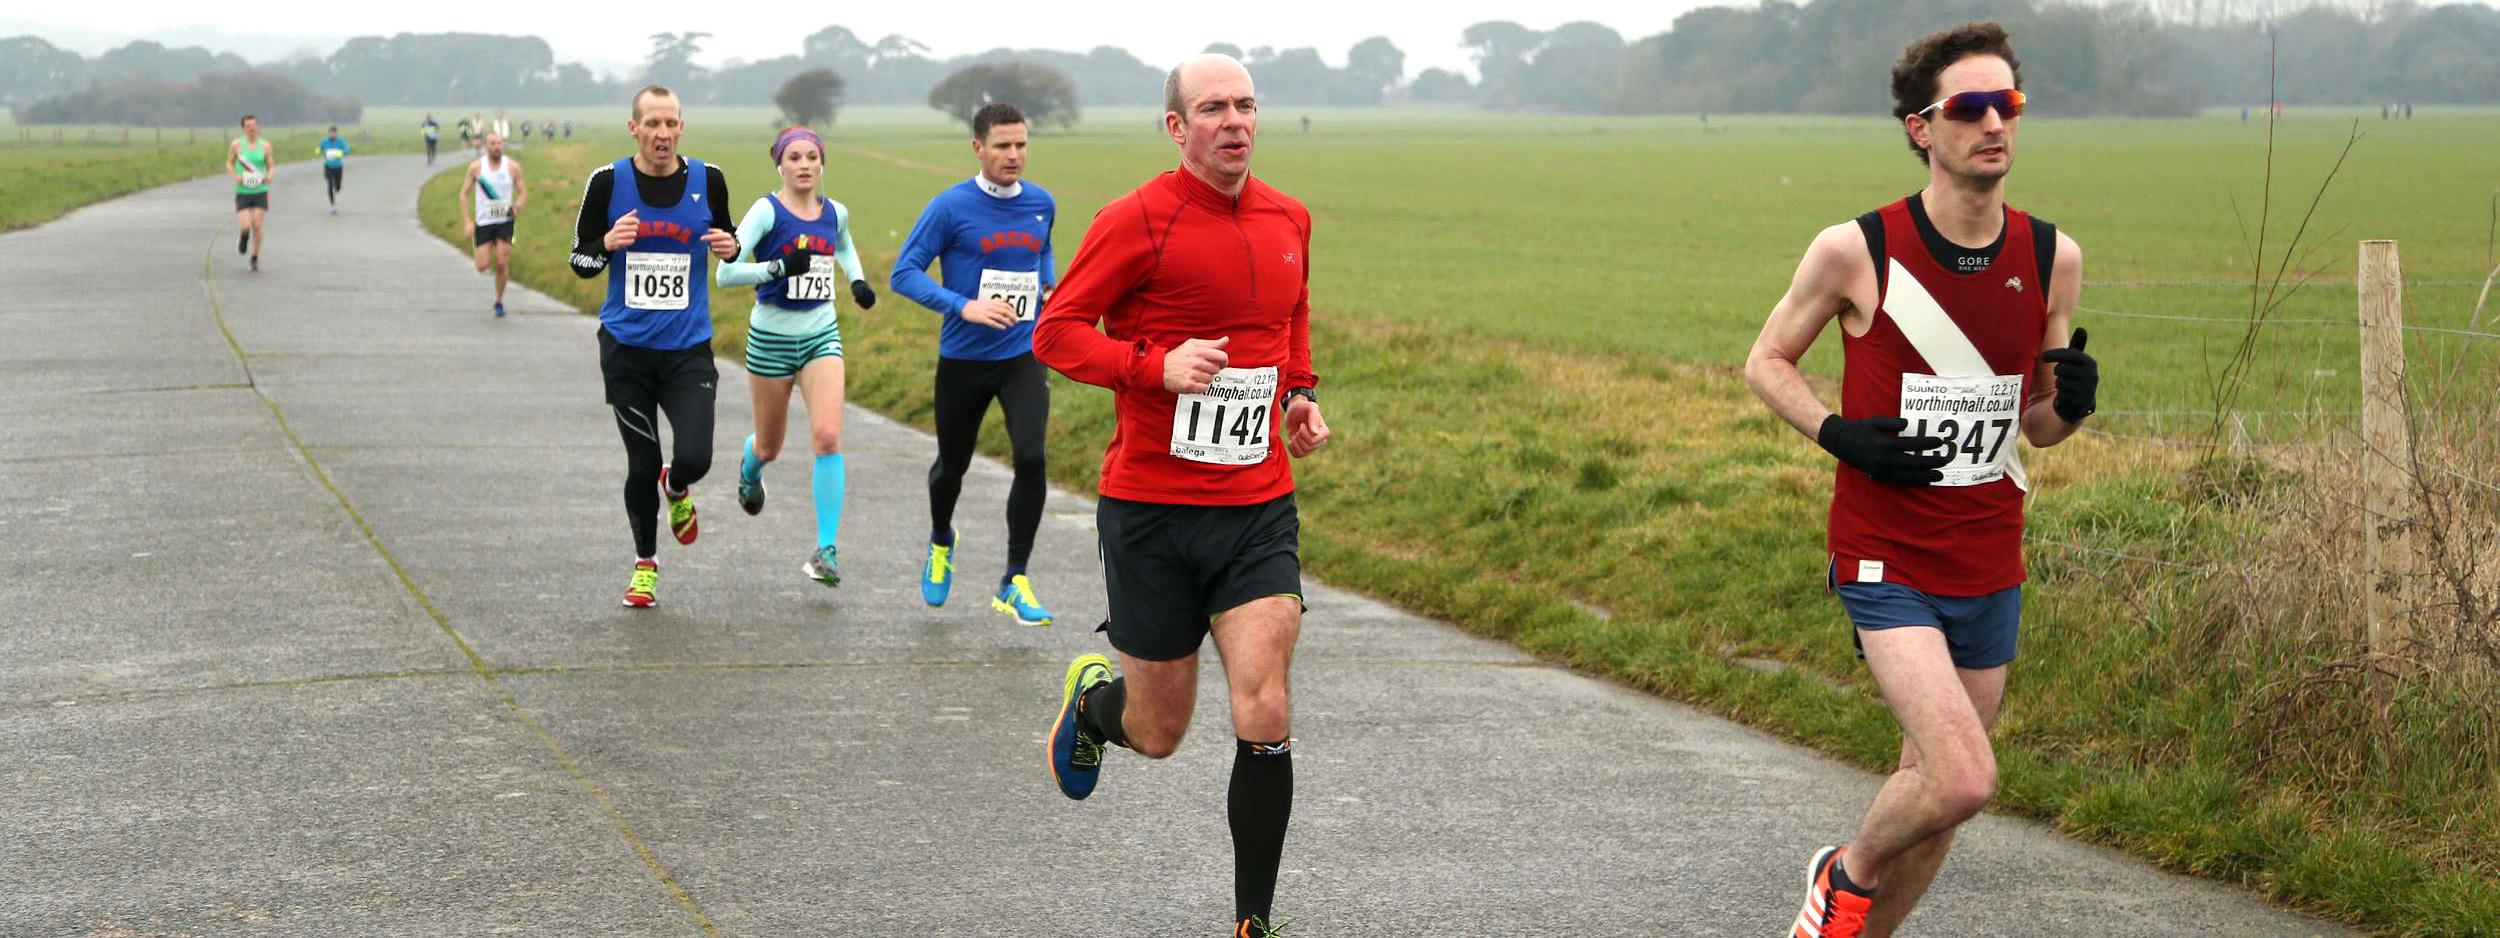 Worthing Half Marathon